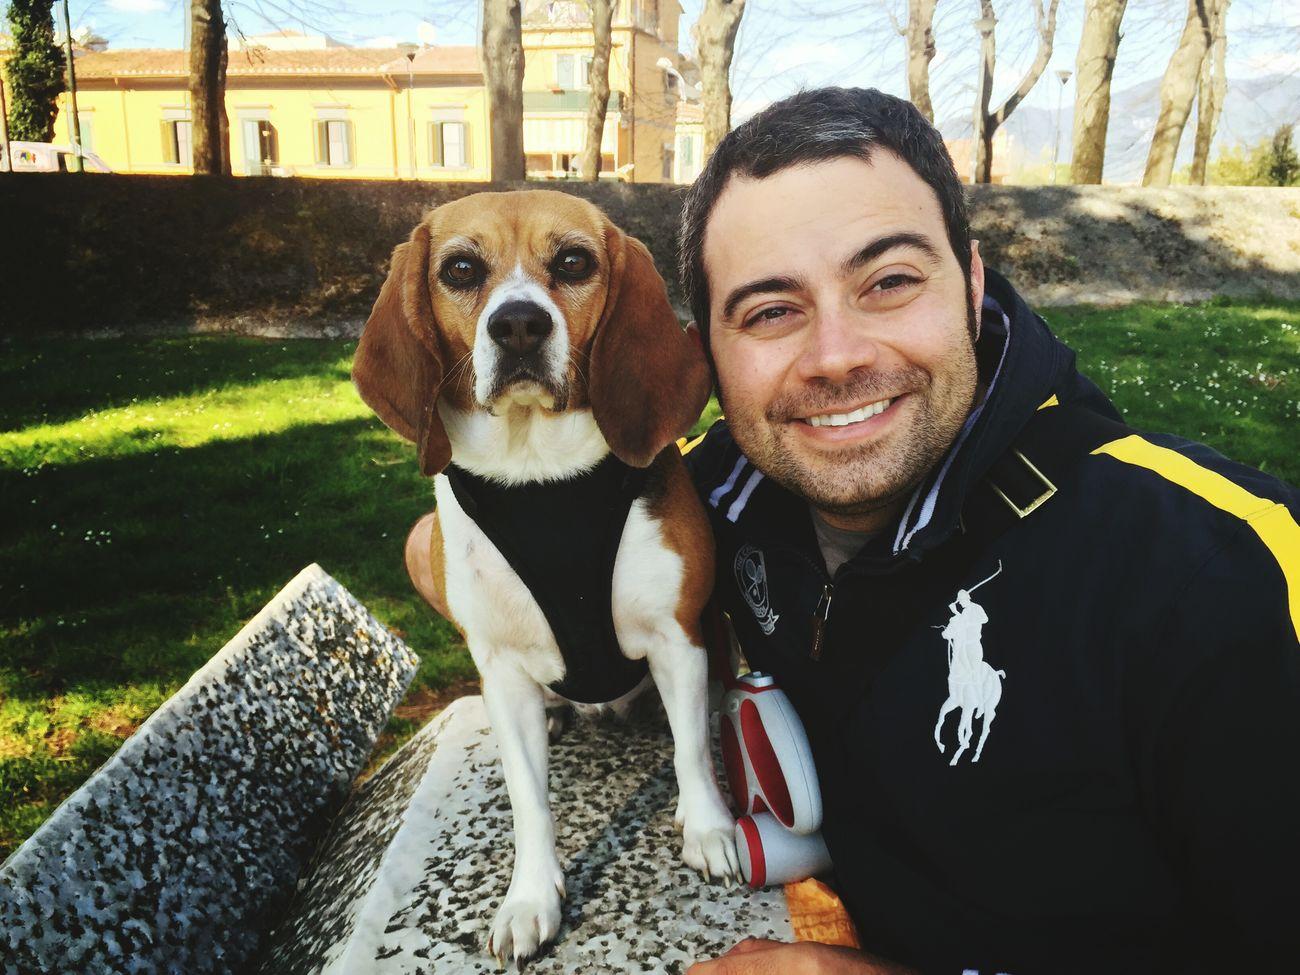 Beagle Beaglelove Alessiolazzeri Amoremio